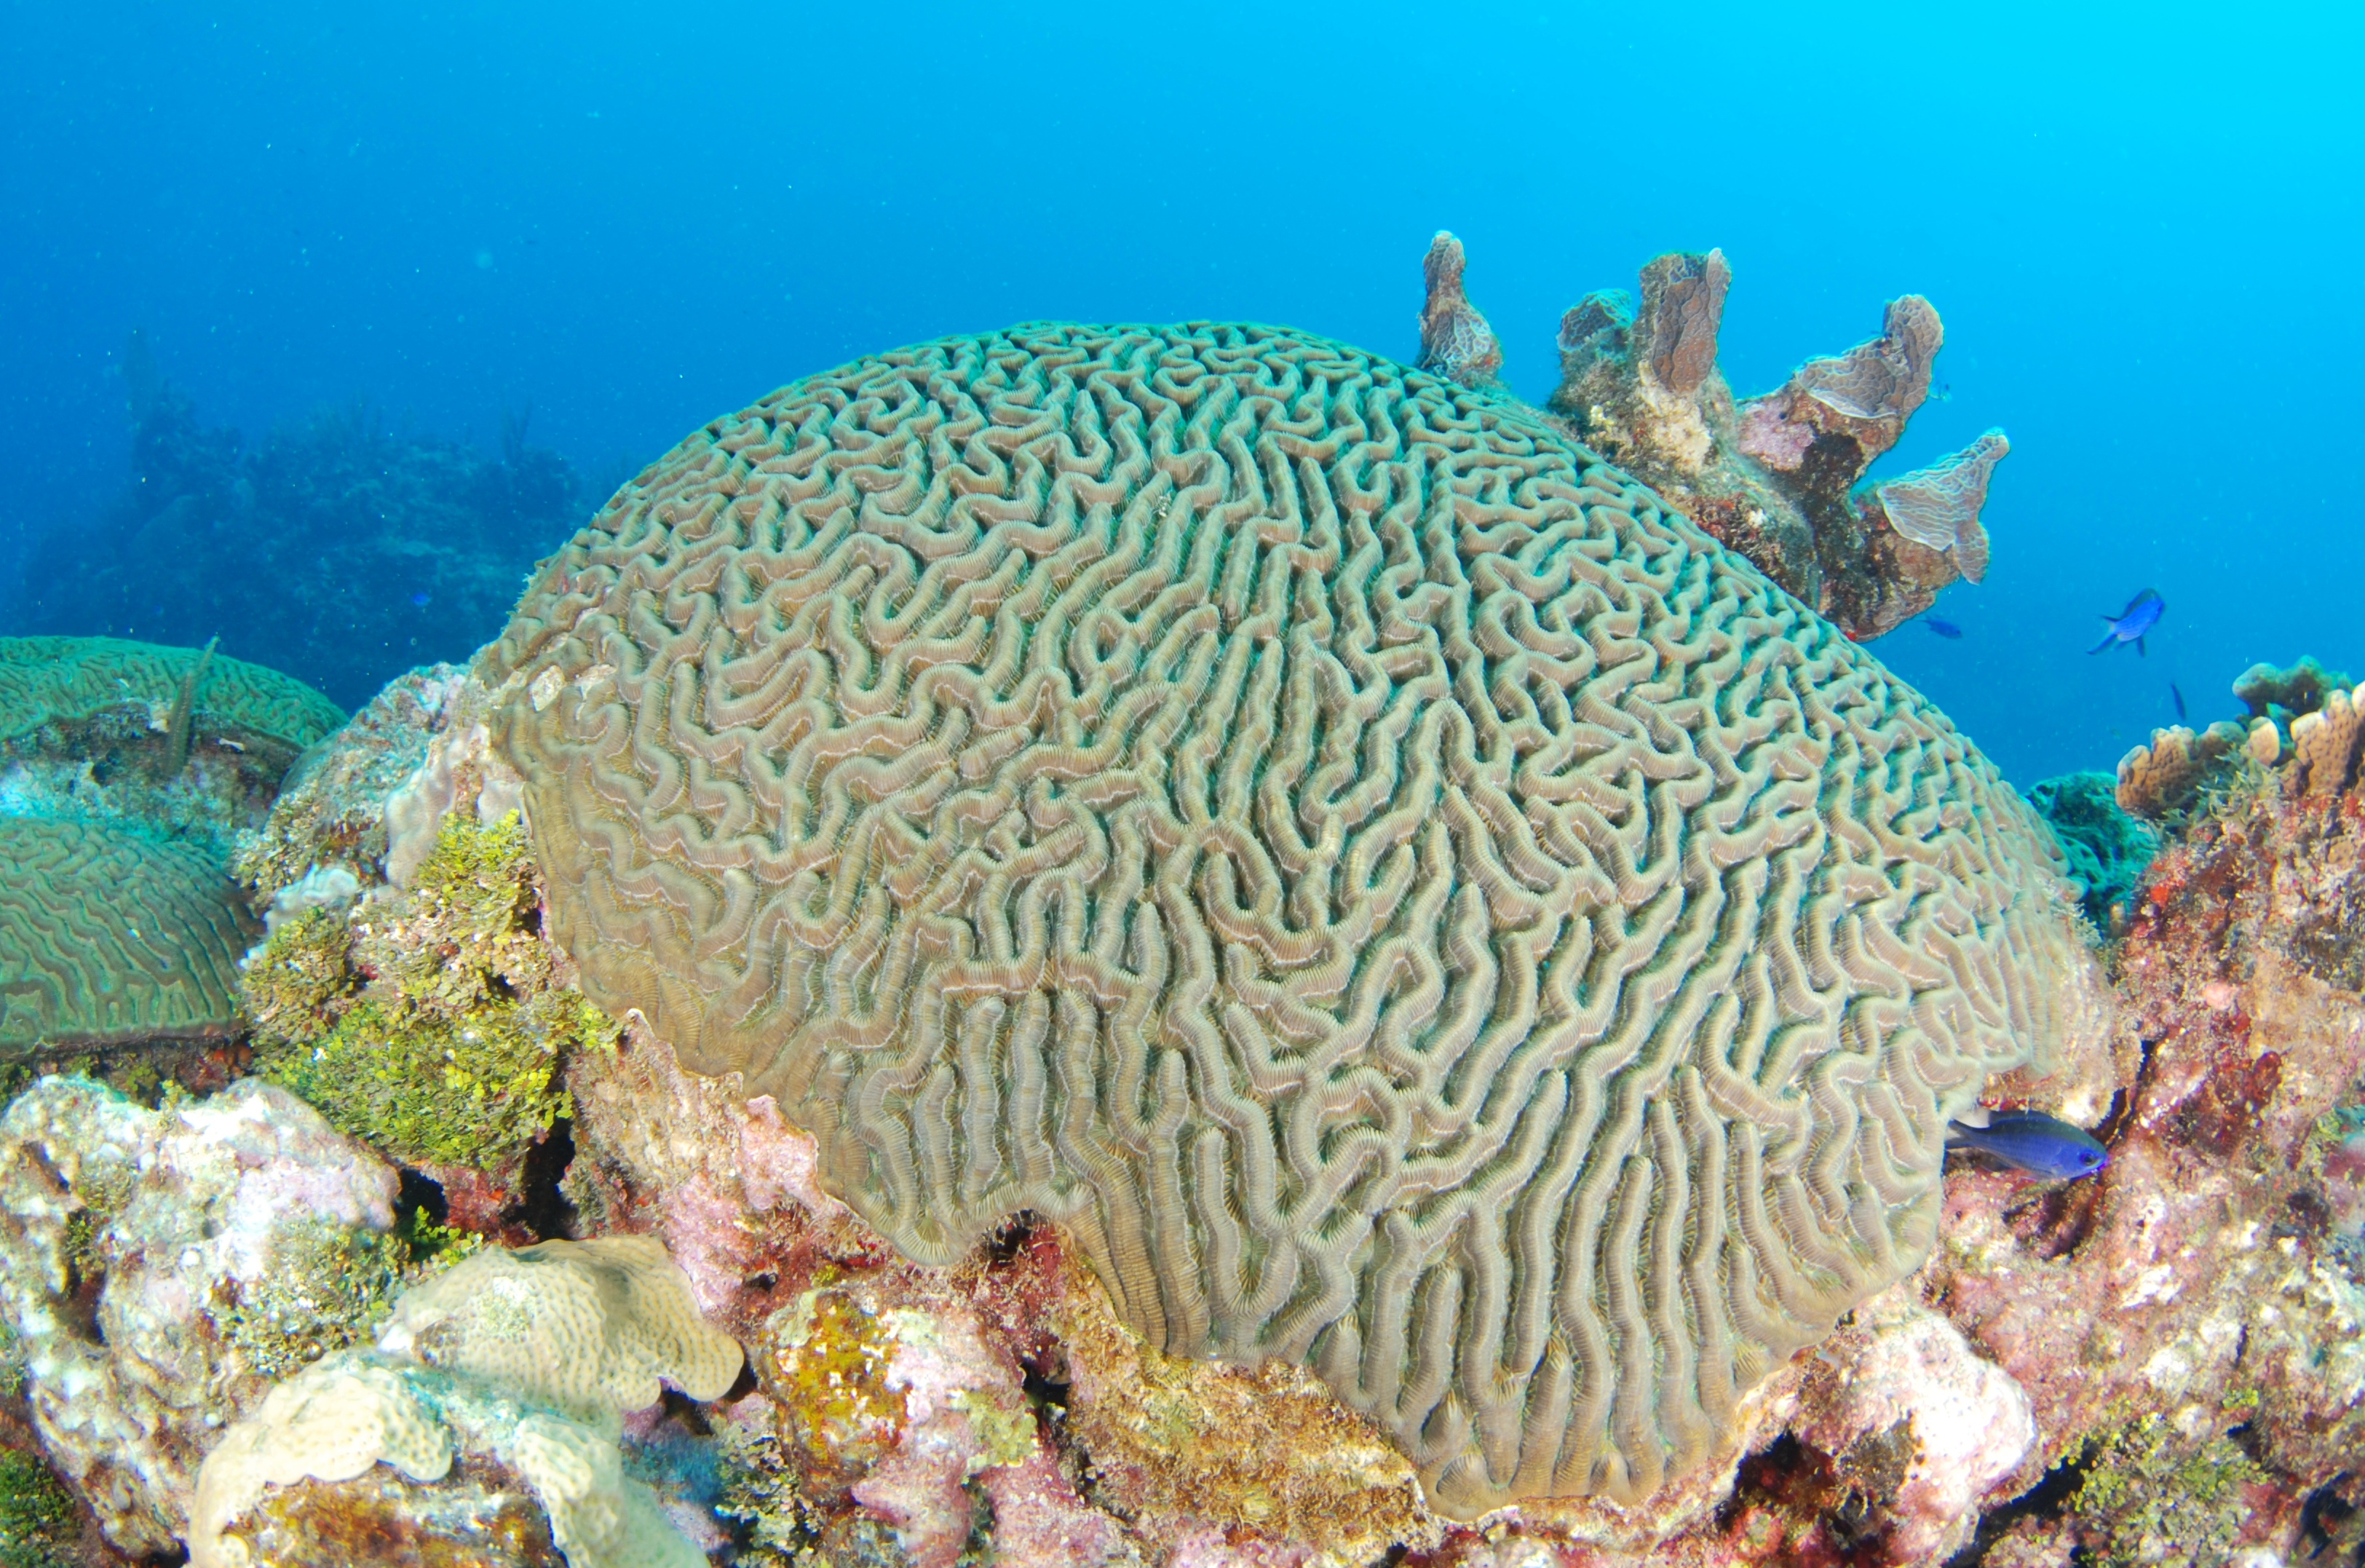 File:Briann coral2.JPG - Wikimedia Commons